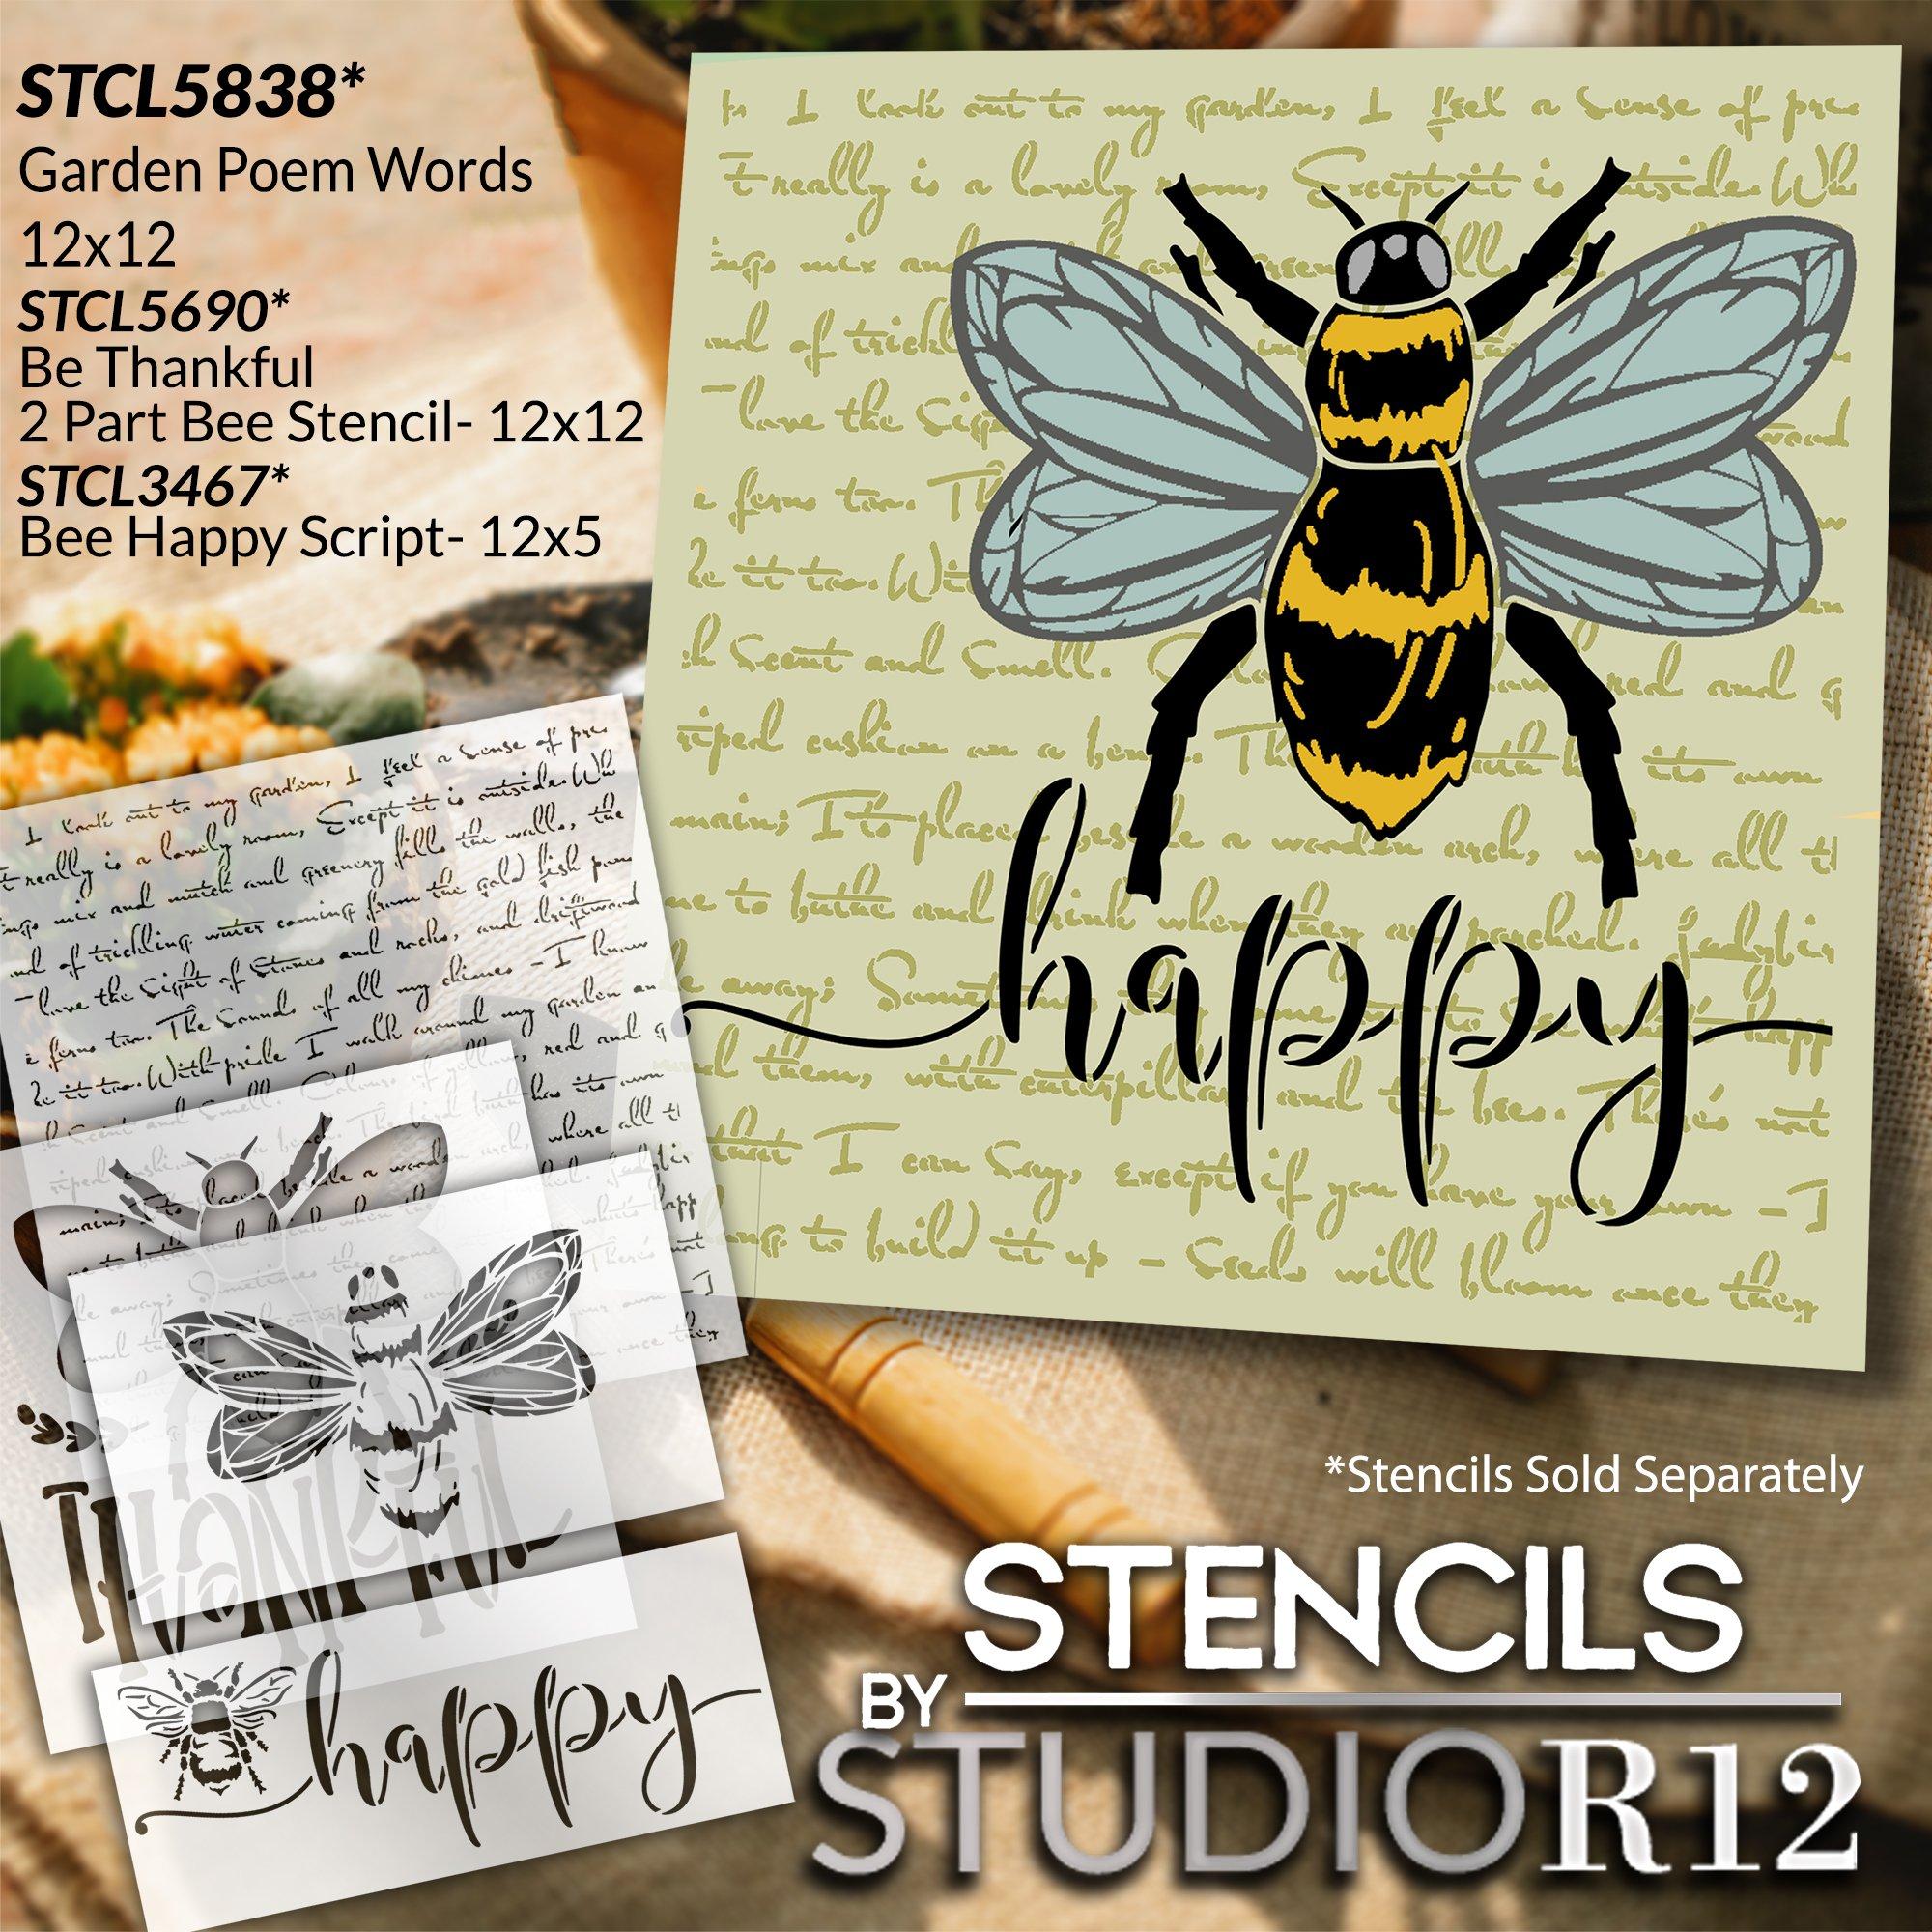 Garden Poem Stencil by StudioR12   Craft DIY Elegant Outdoor Home Decor   Paint Spring & Summer Wood Sign   Reusable Mylar Template   Select Size